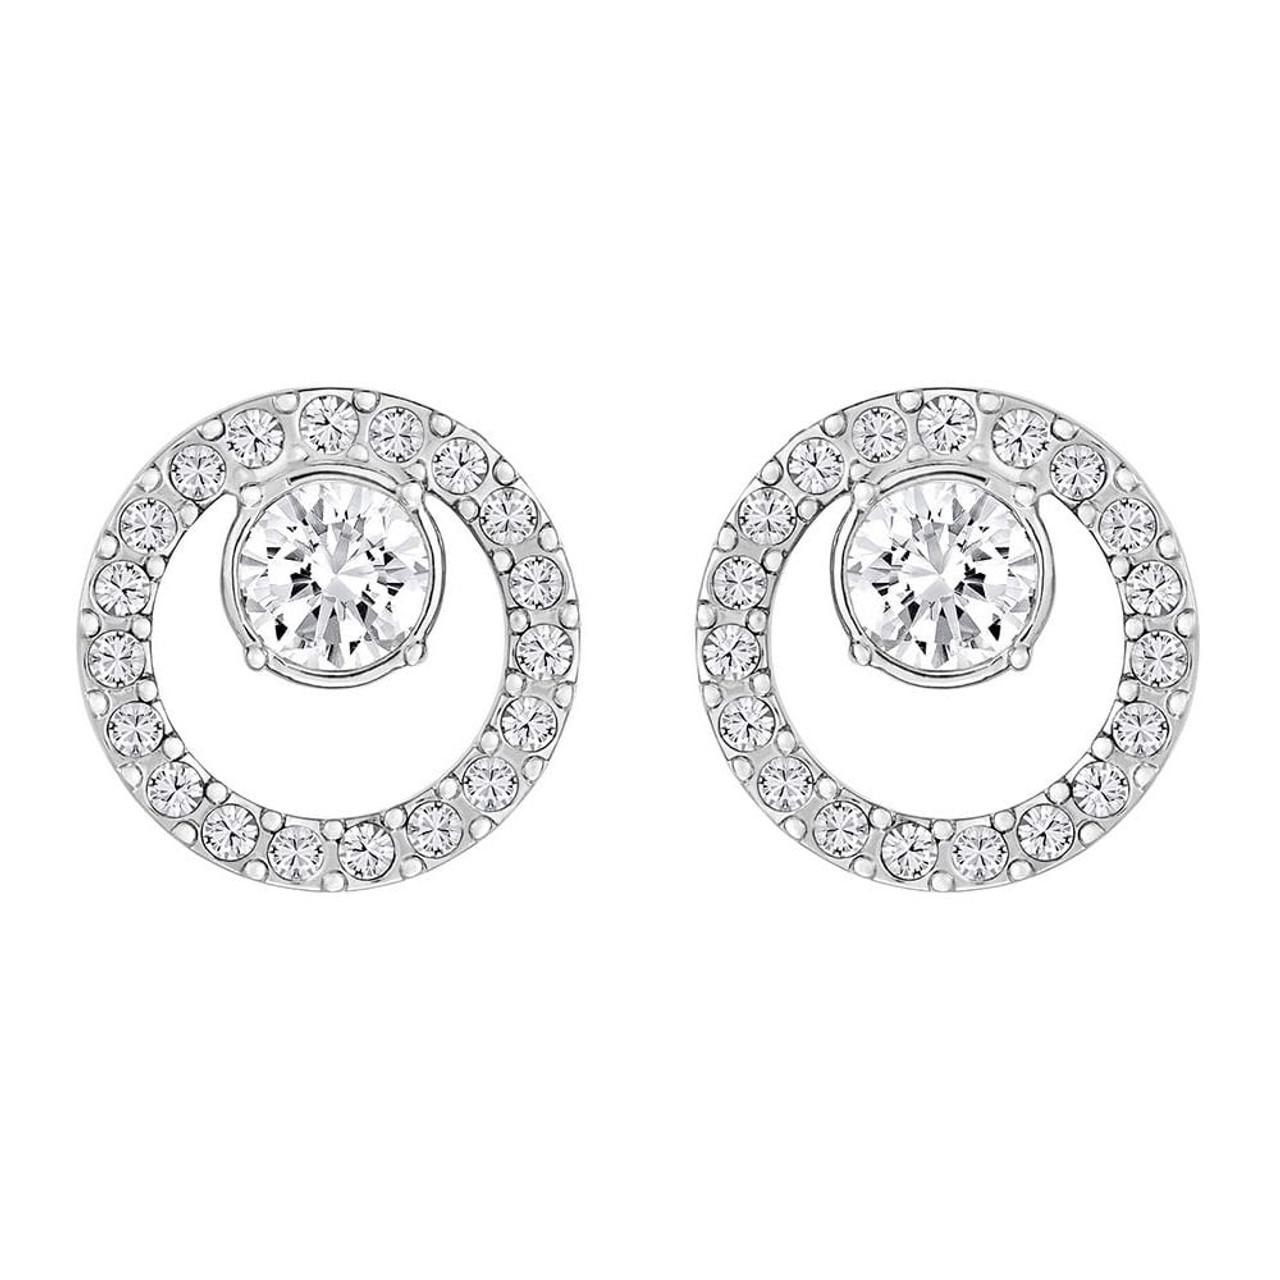 31f1c8cb1 Swarovski Creativity Small Circles Stud Earrings